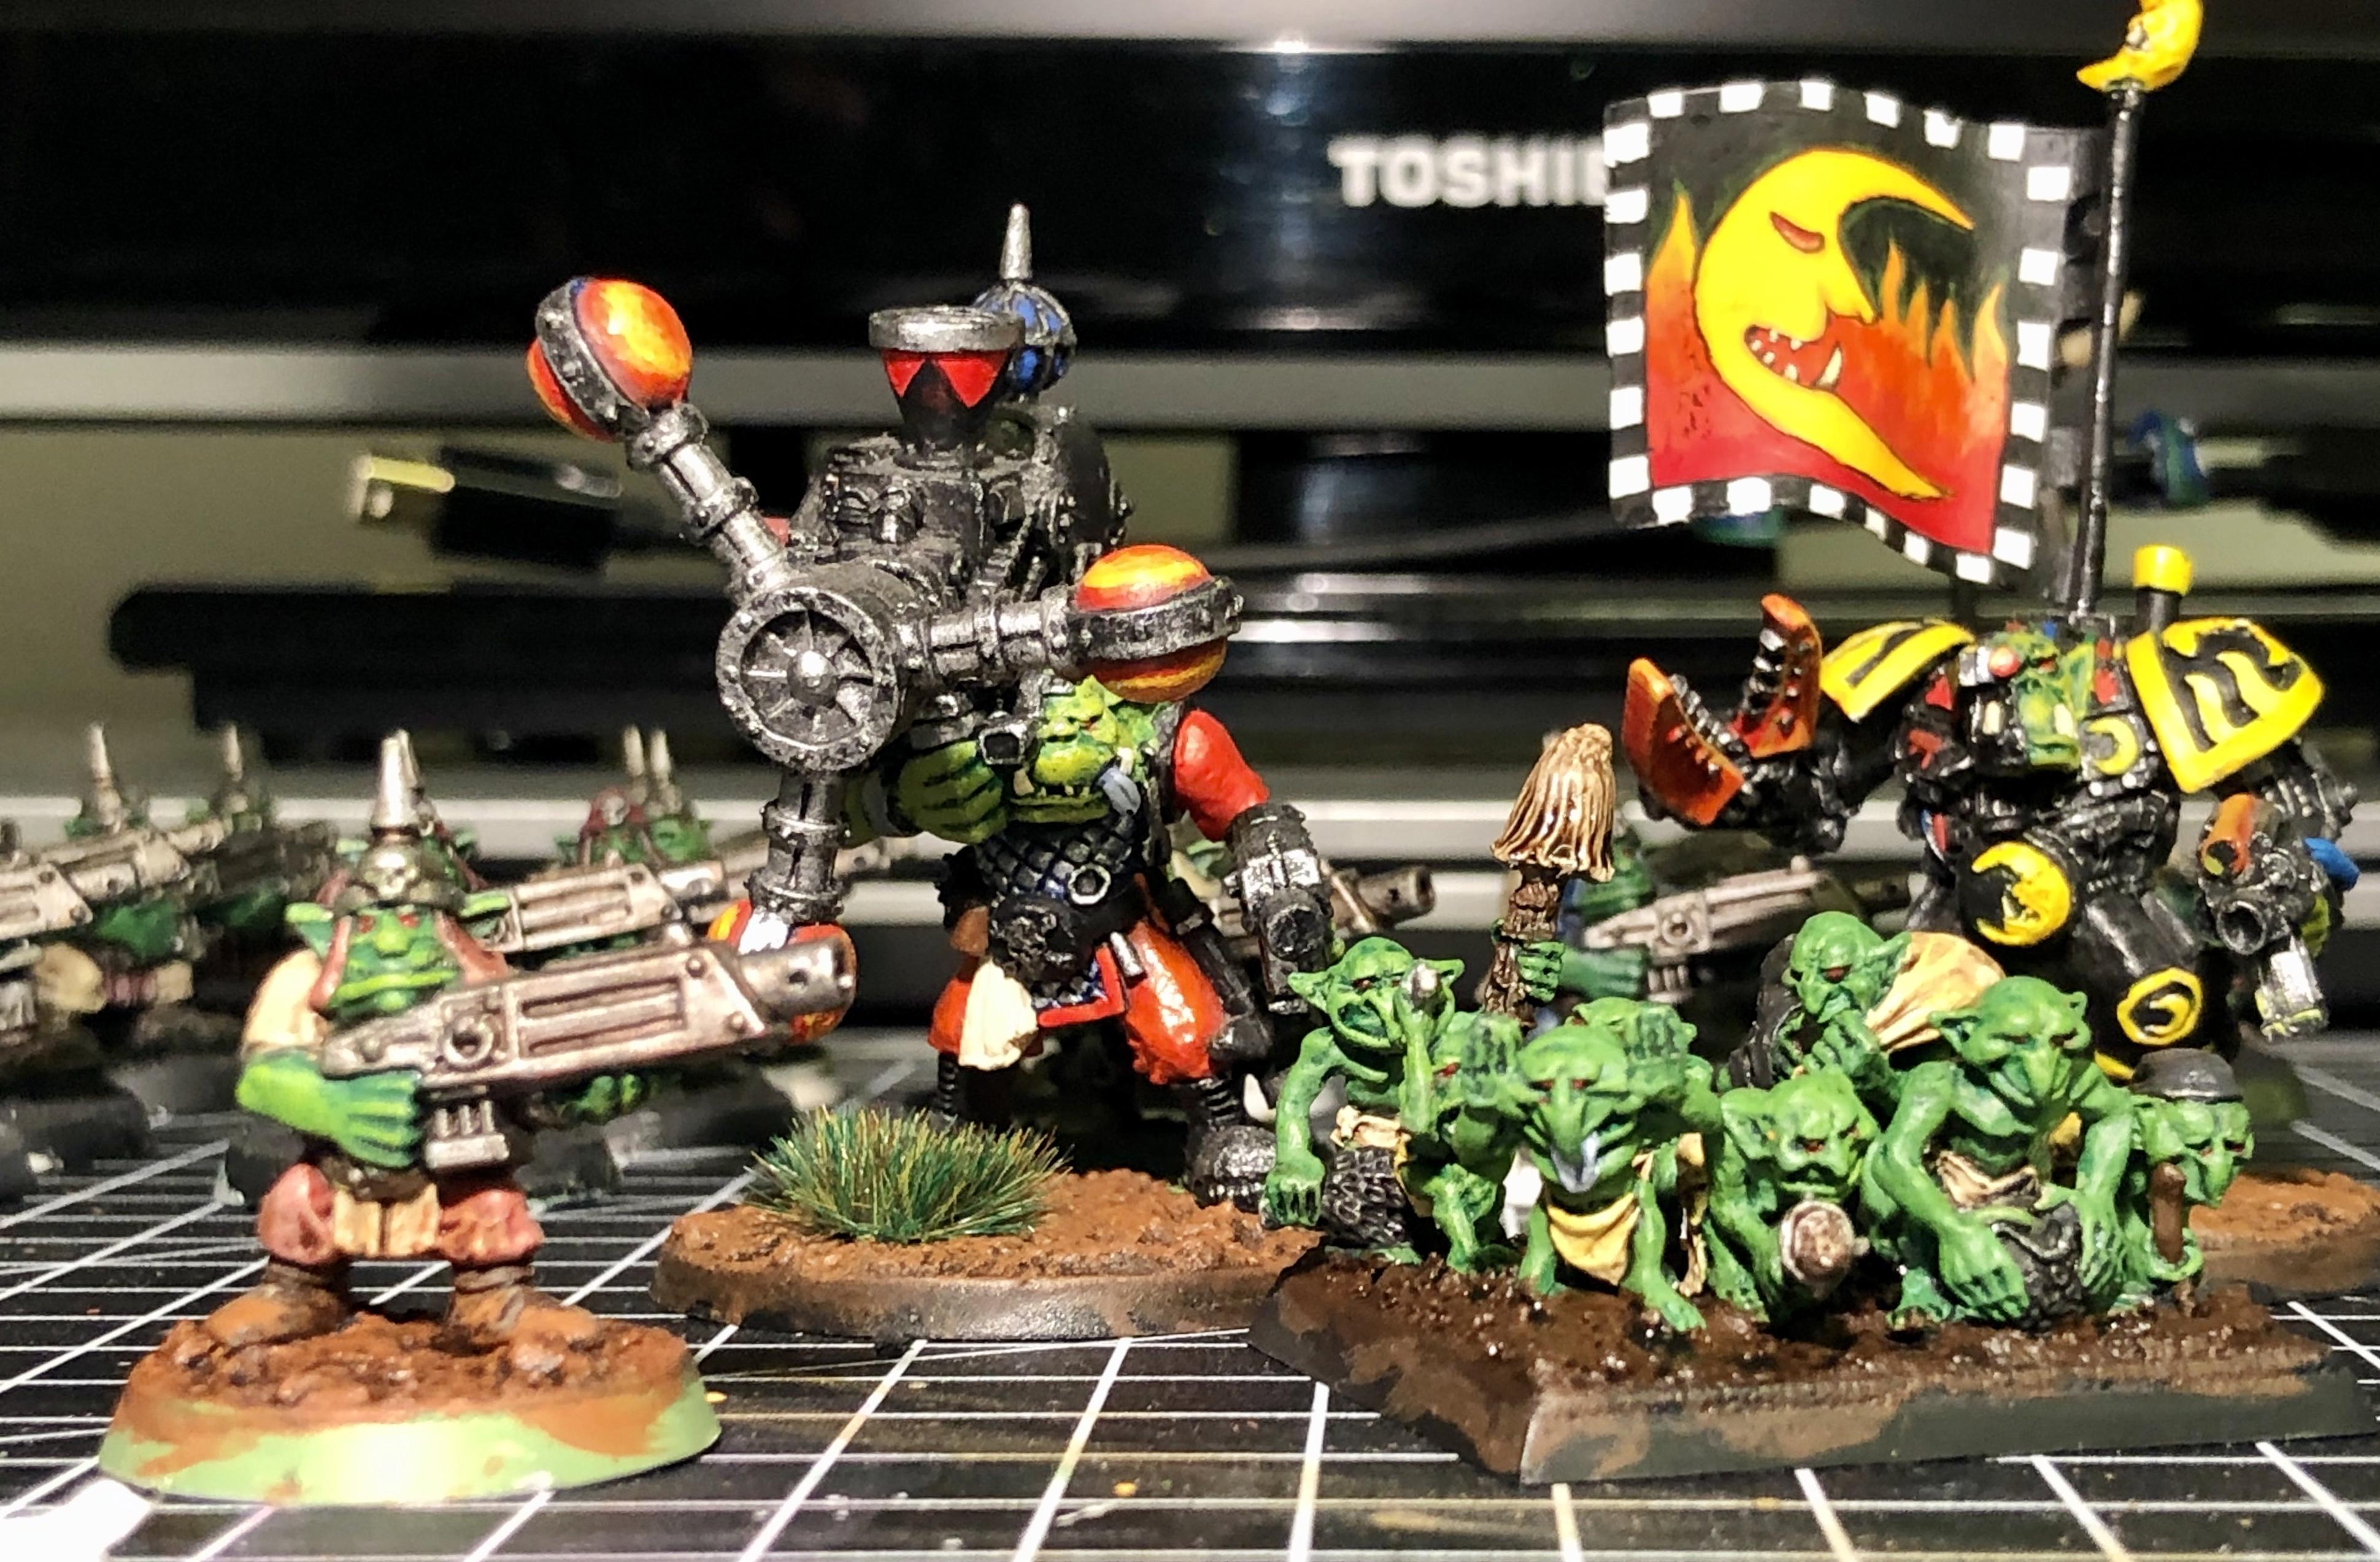 2nd Edition, Bik Mek, Gretchin, Mega Armor, Nob, Orks, Shokk Attack Gun, Snotlings, Warhammer 40,000